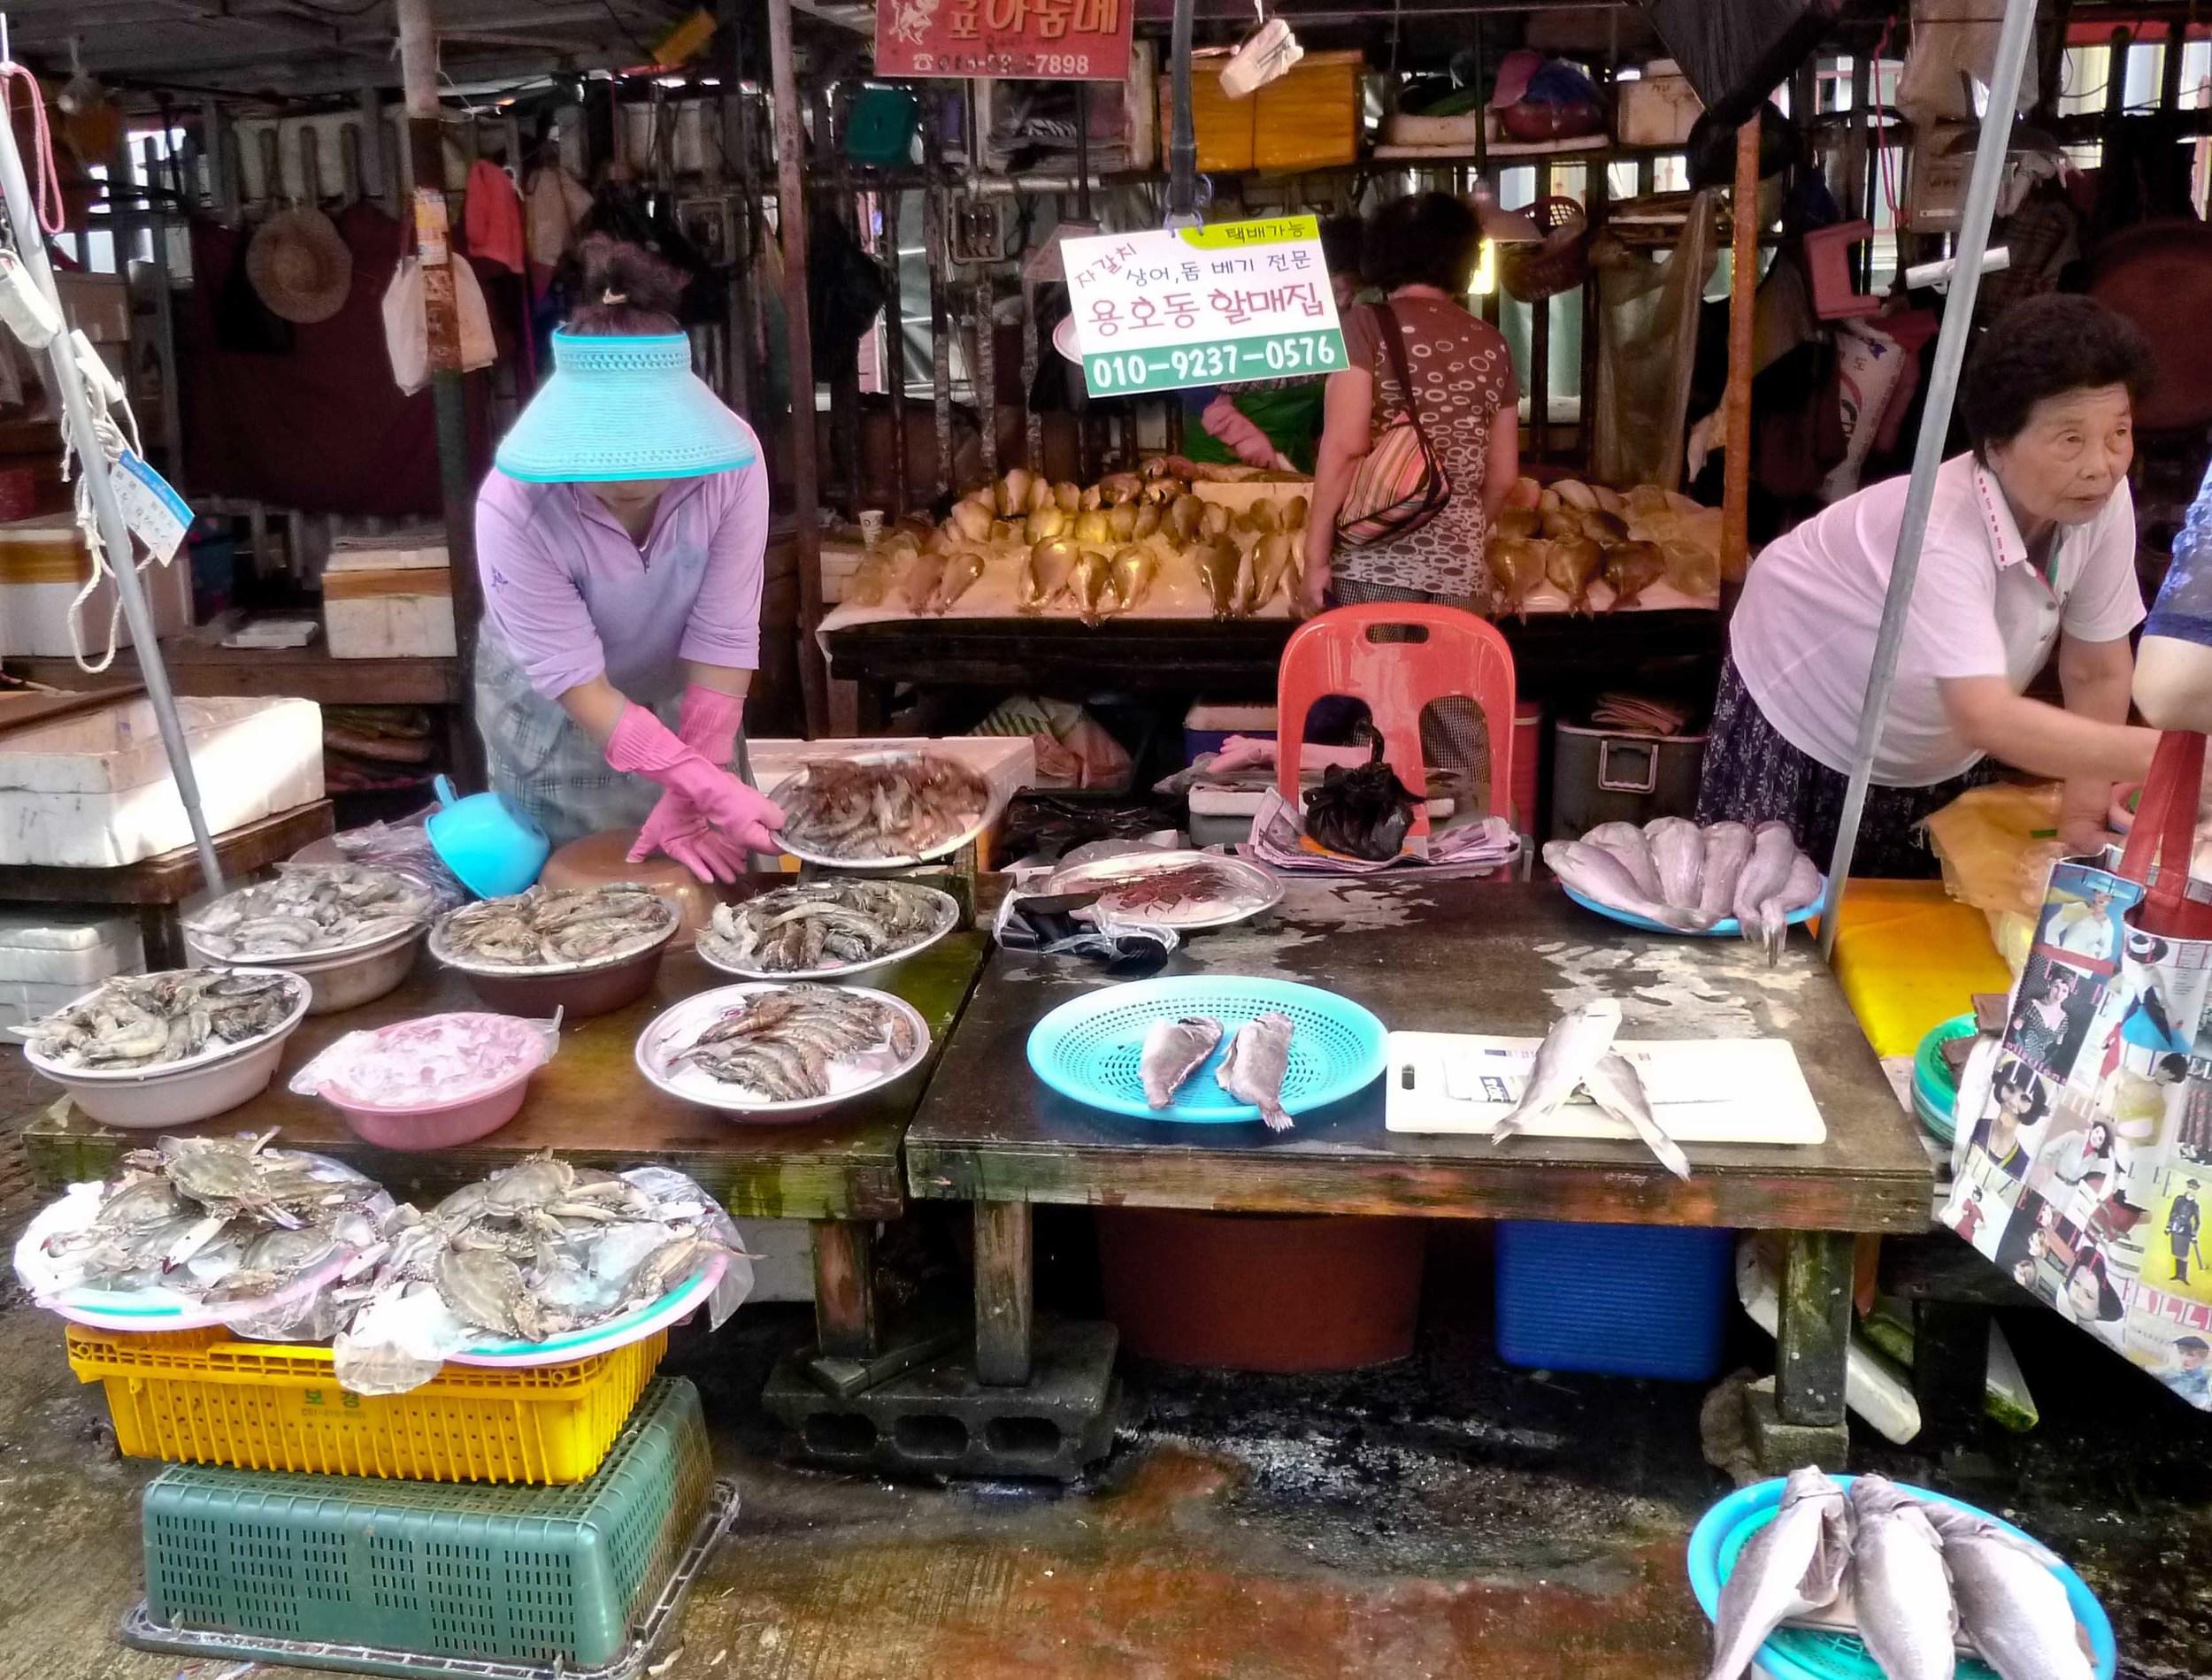 pusan fish market 3.jpg